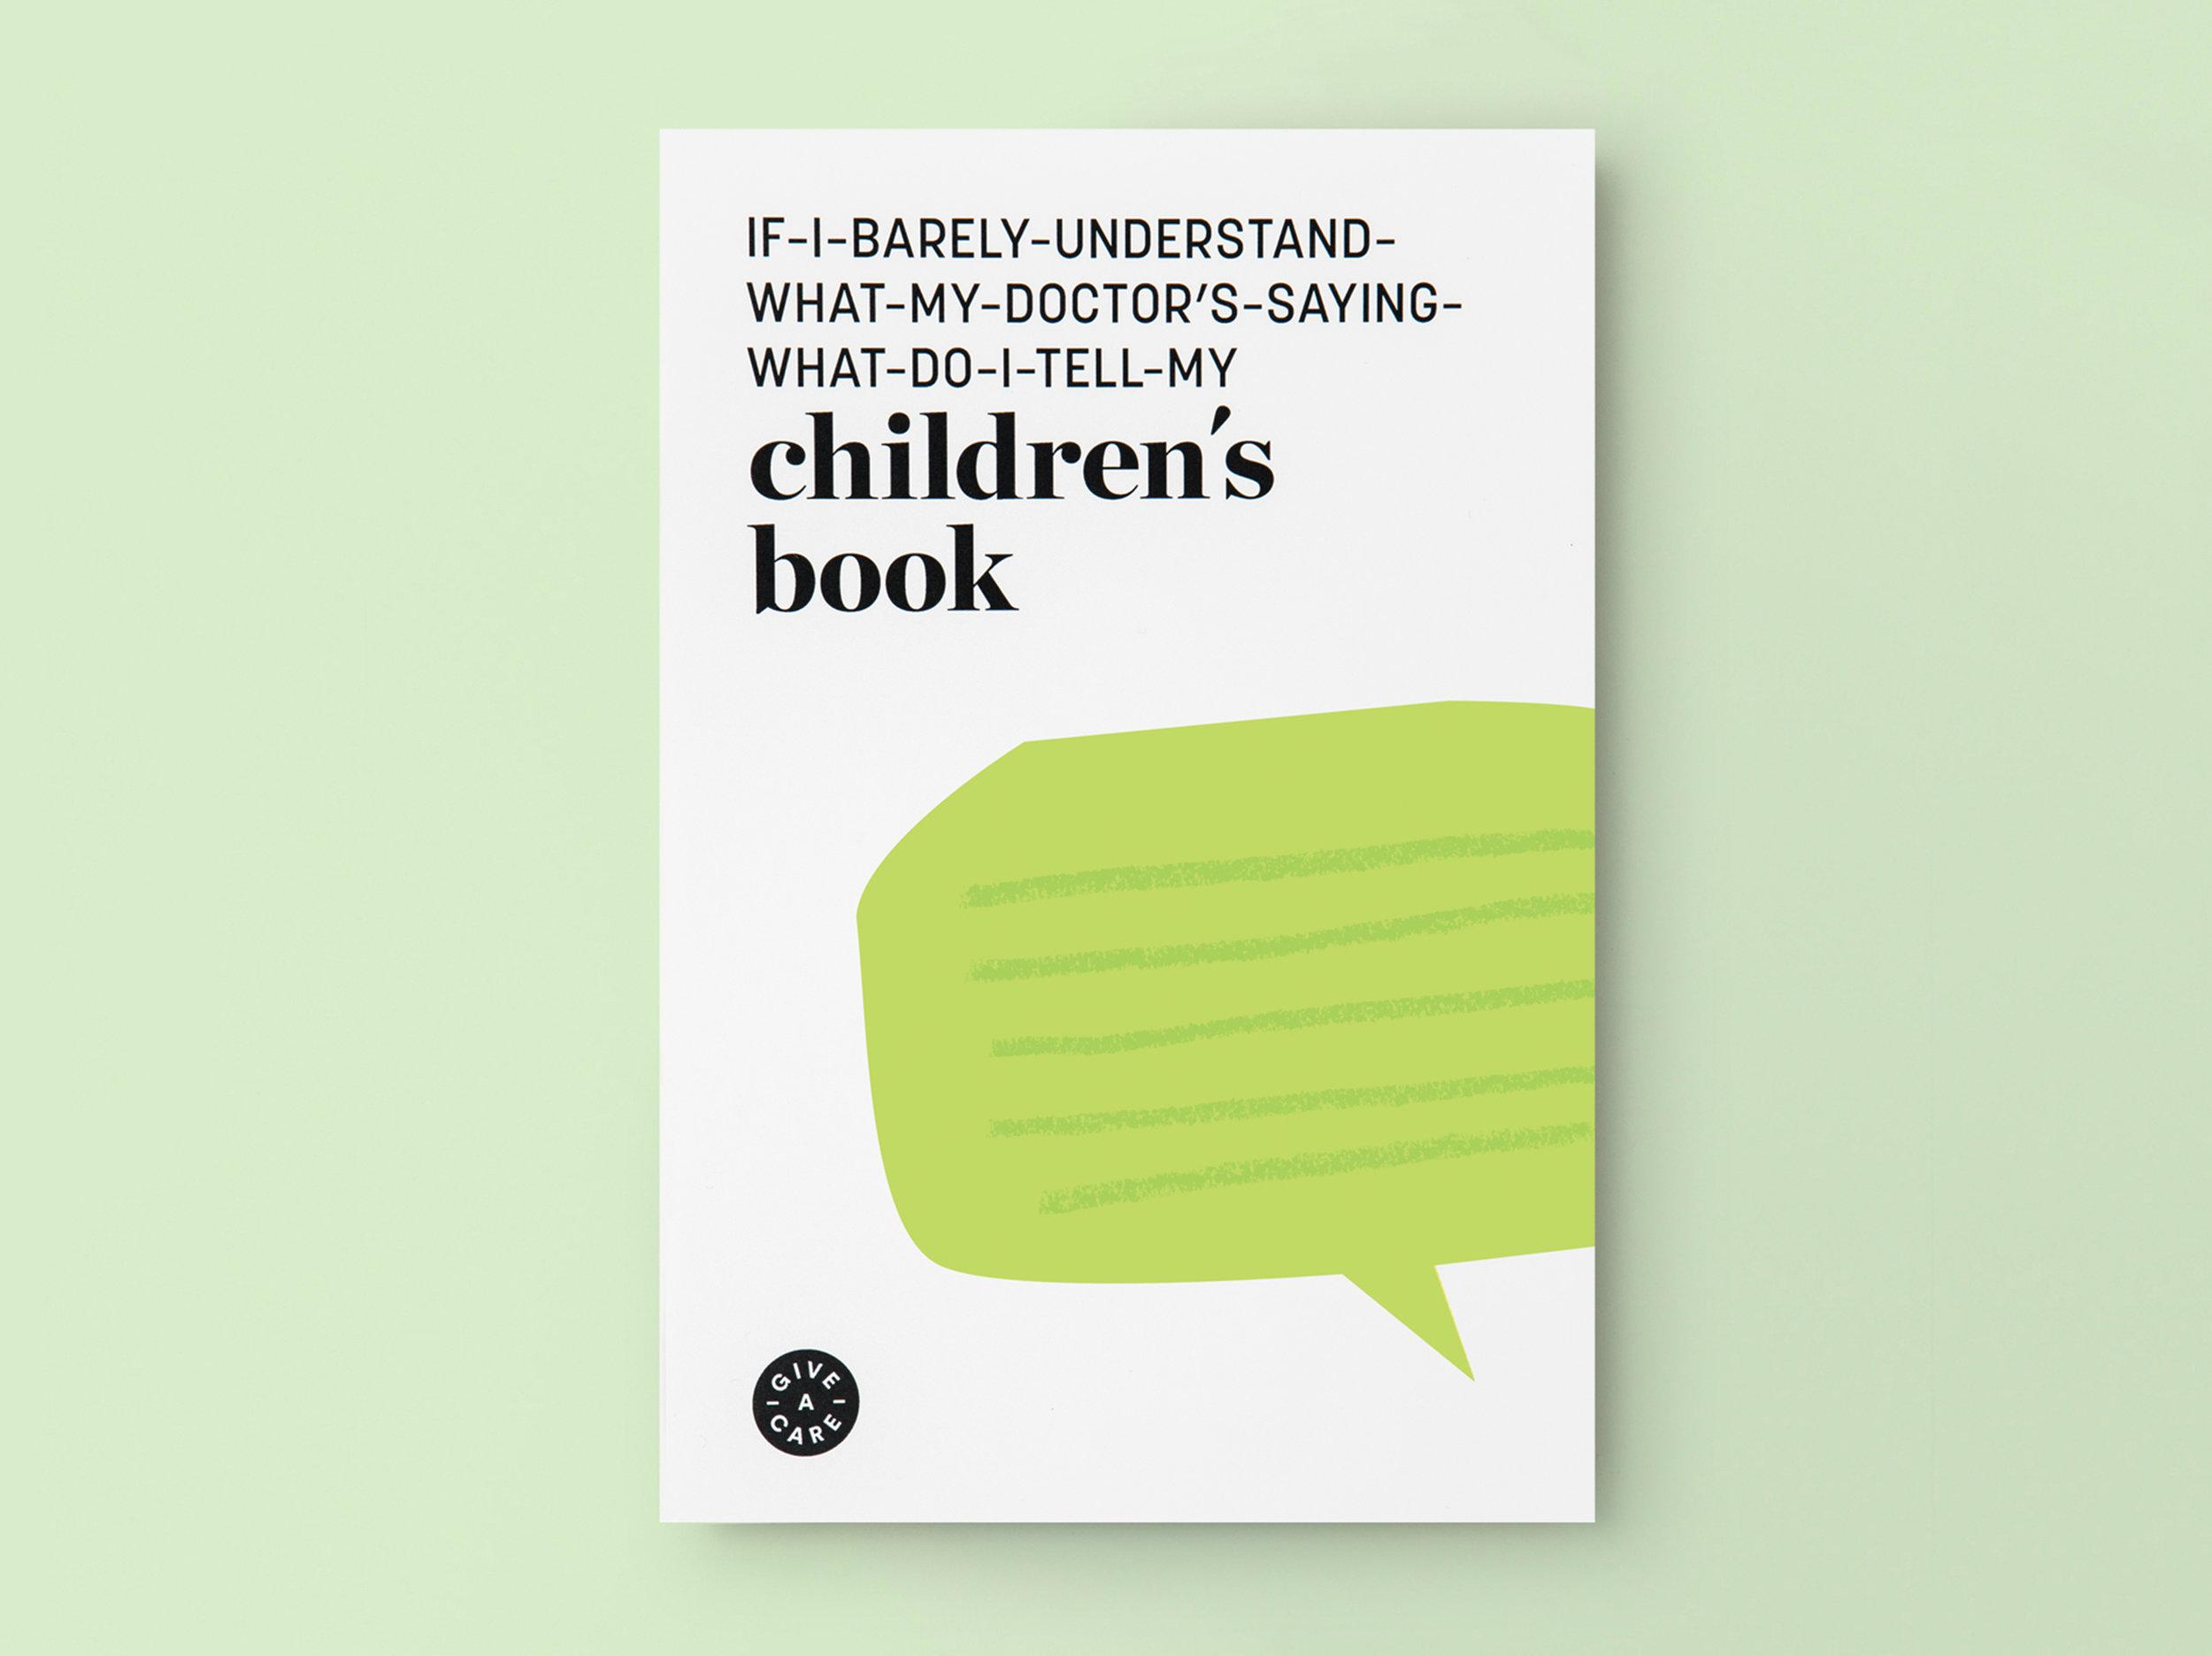 10_CHILDRENS BOOK.jpg